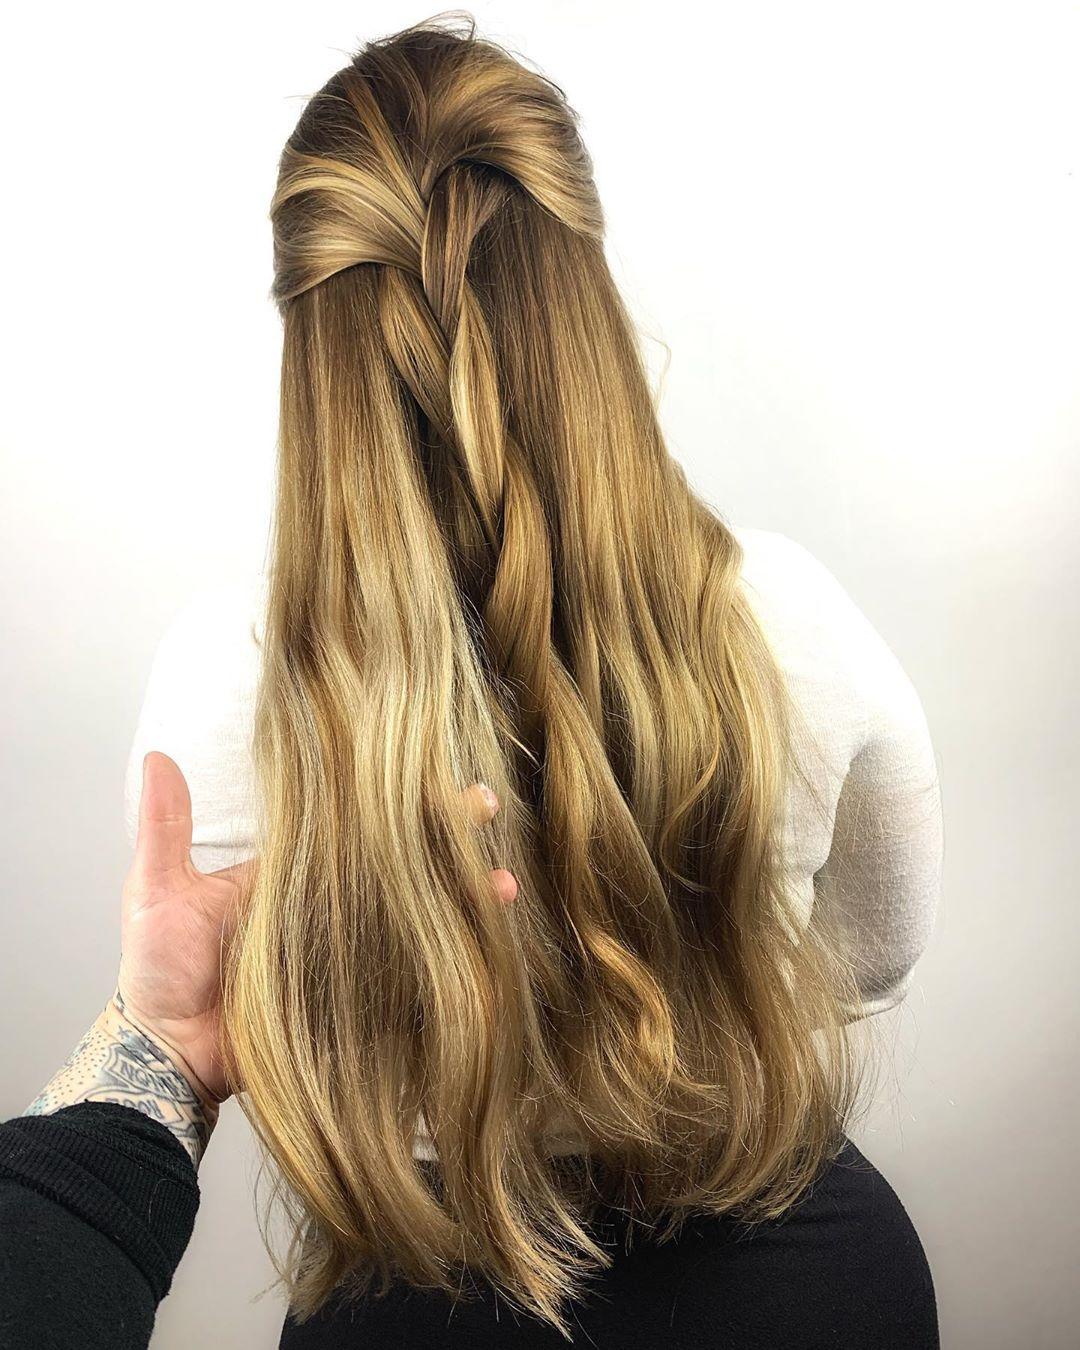 Braided hair with lowlights